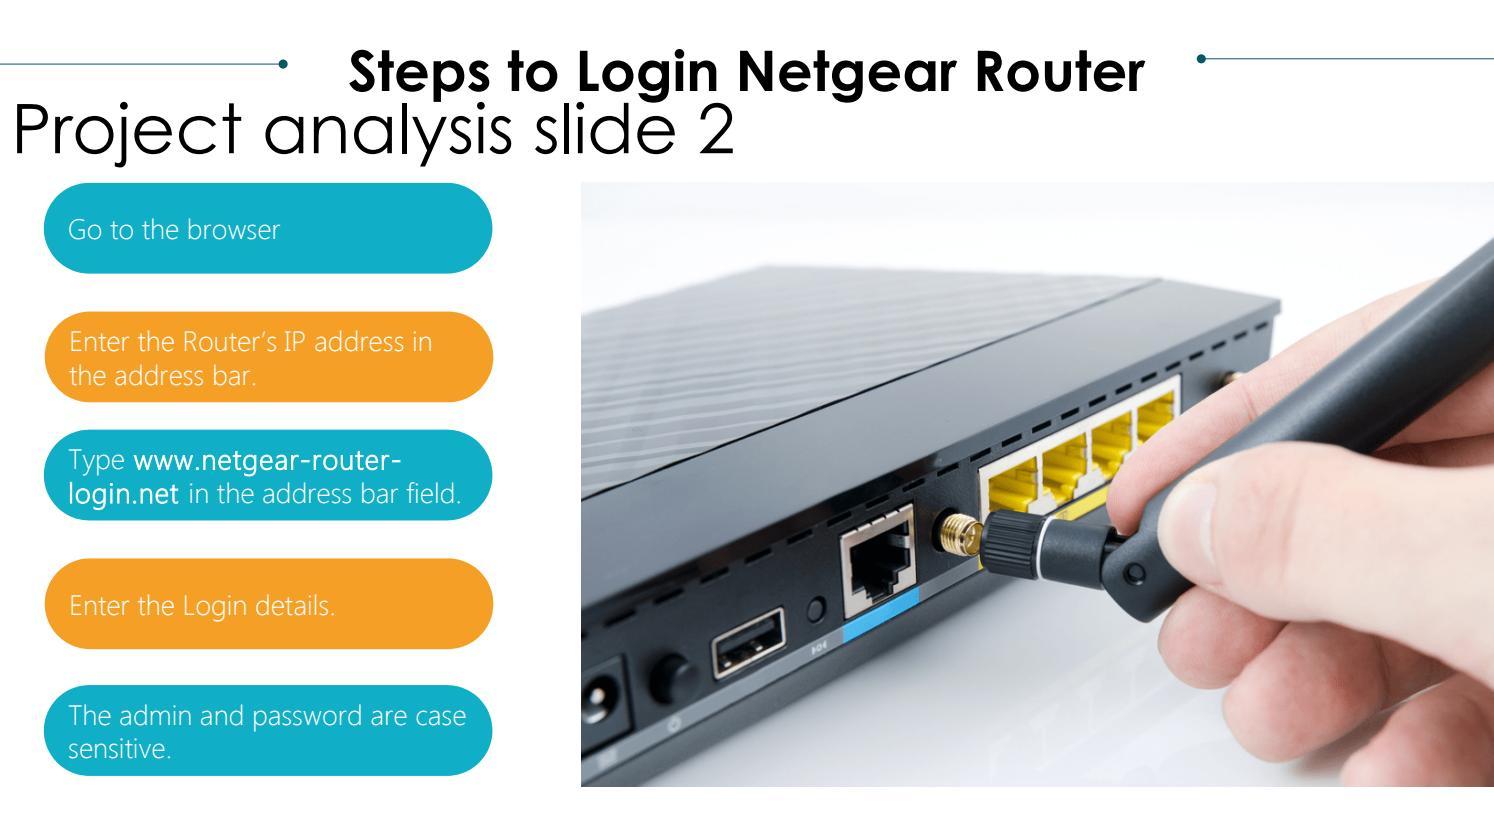 Steps to Login Netgear Router by Netgear Router Login - issuu